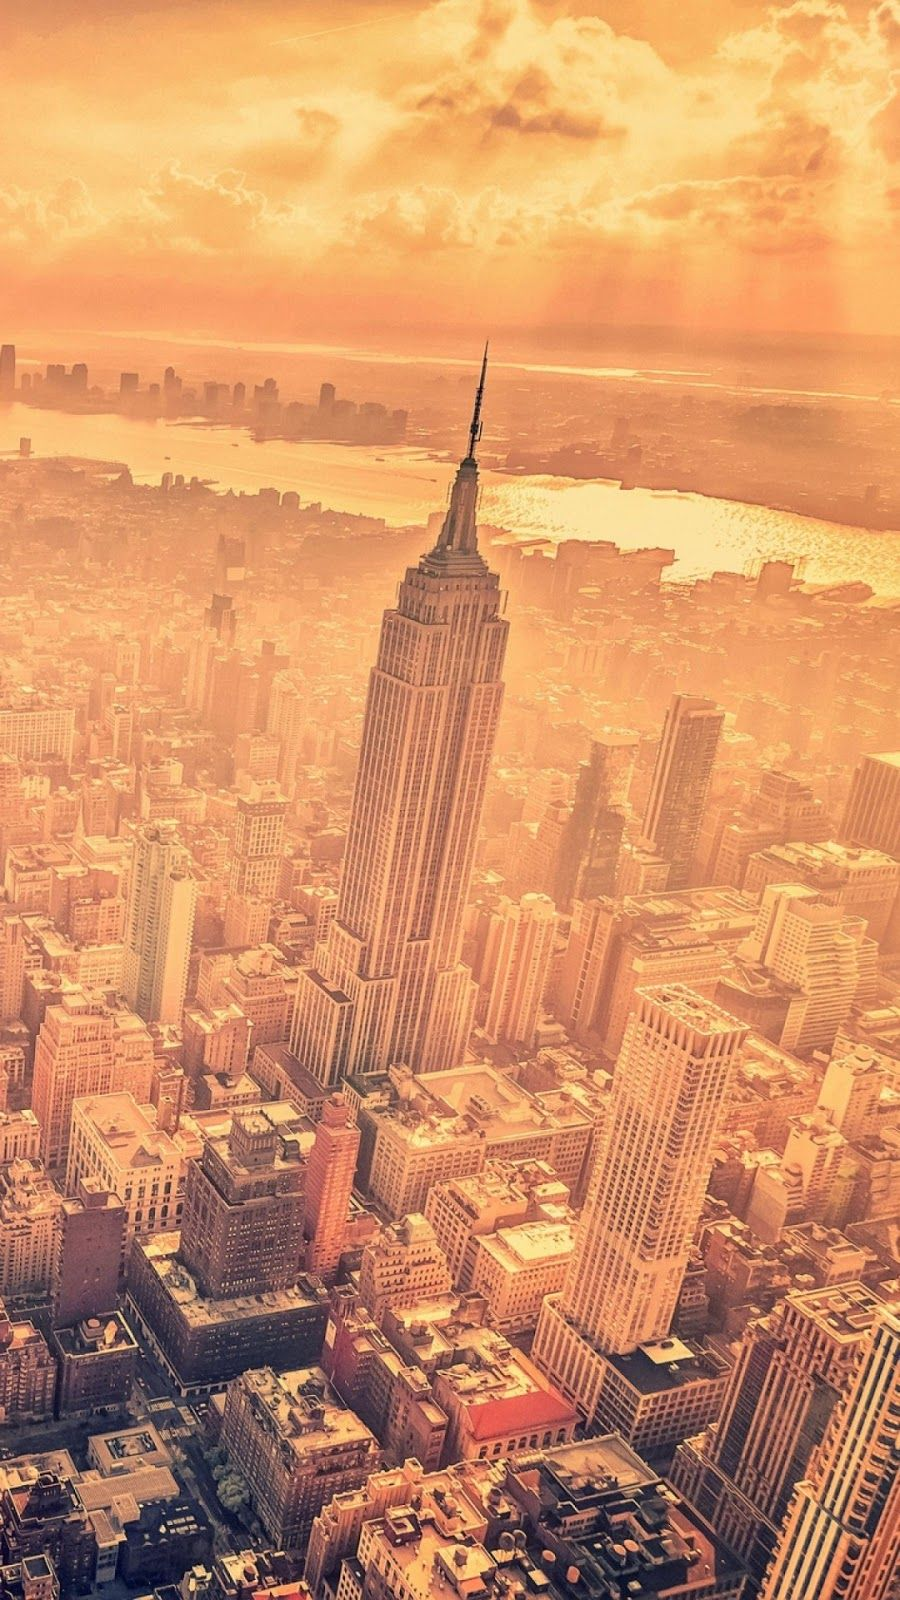 Iphone Wallpapers New York Hd Iphone Wallpaper New York